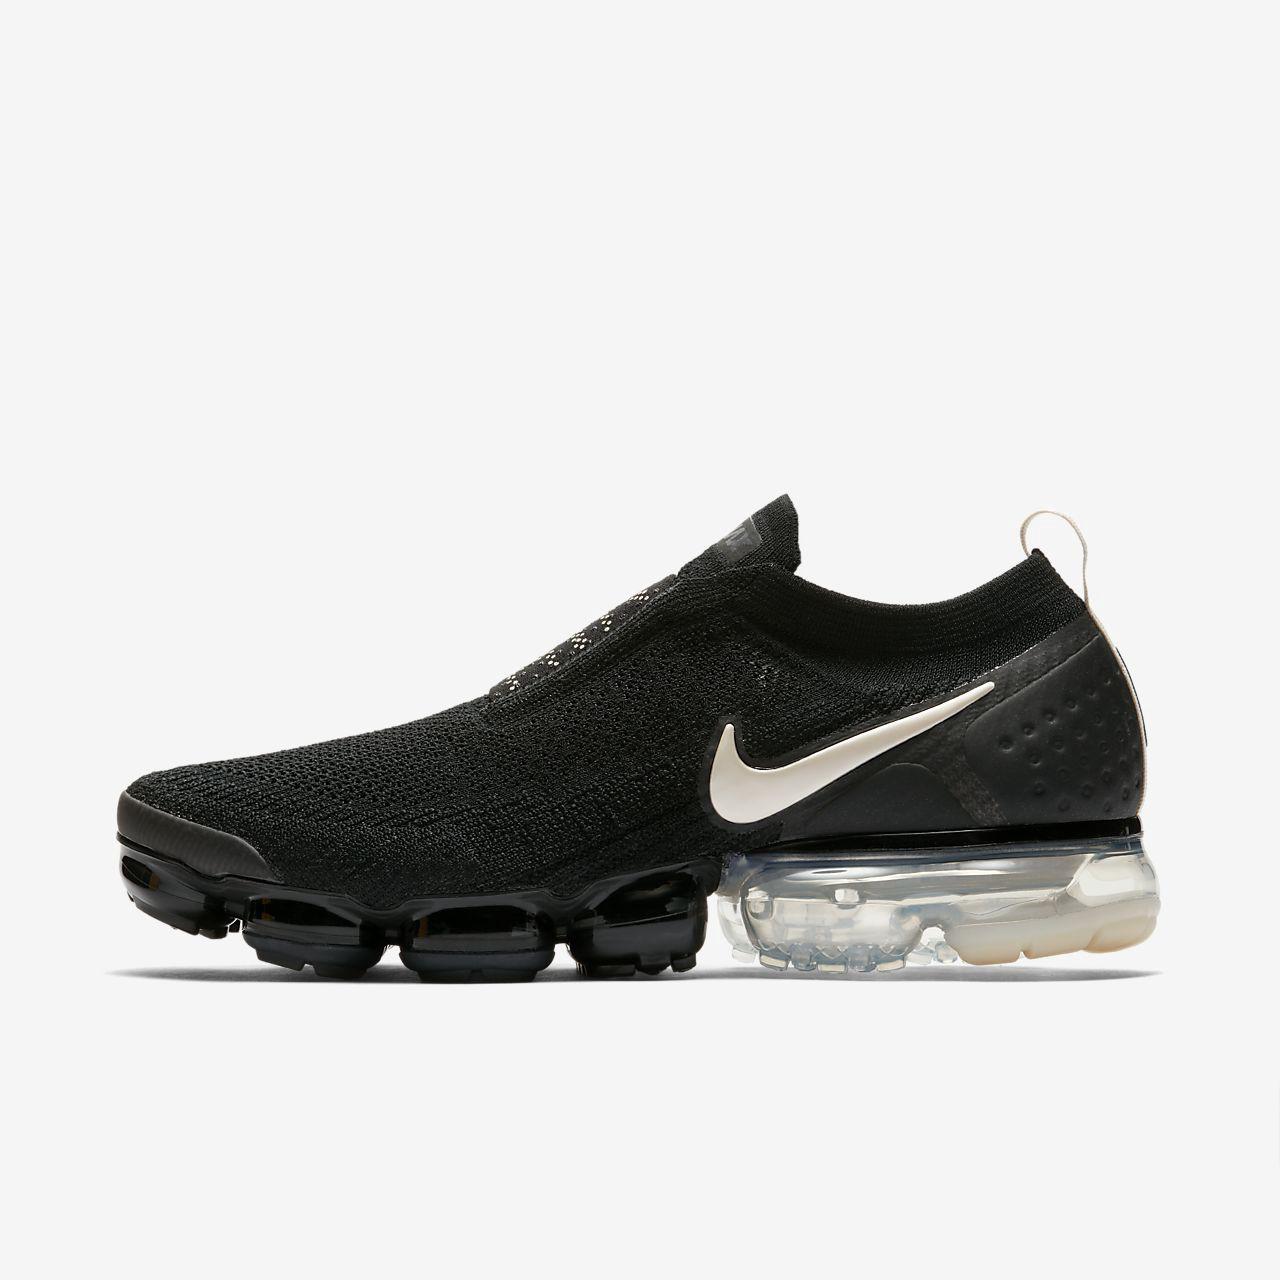 nike air vapormax flyknit moc 2 unisex running shoe